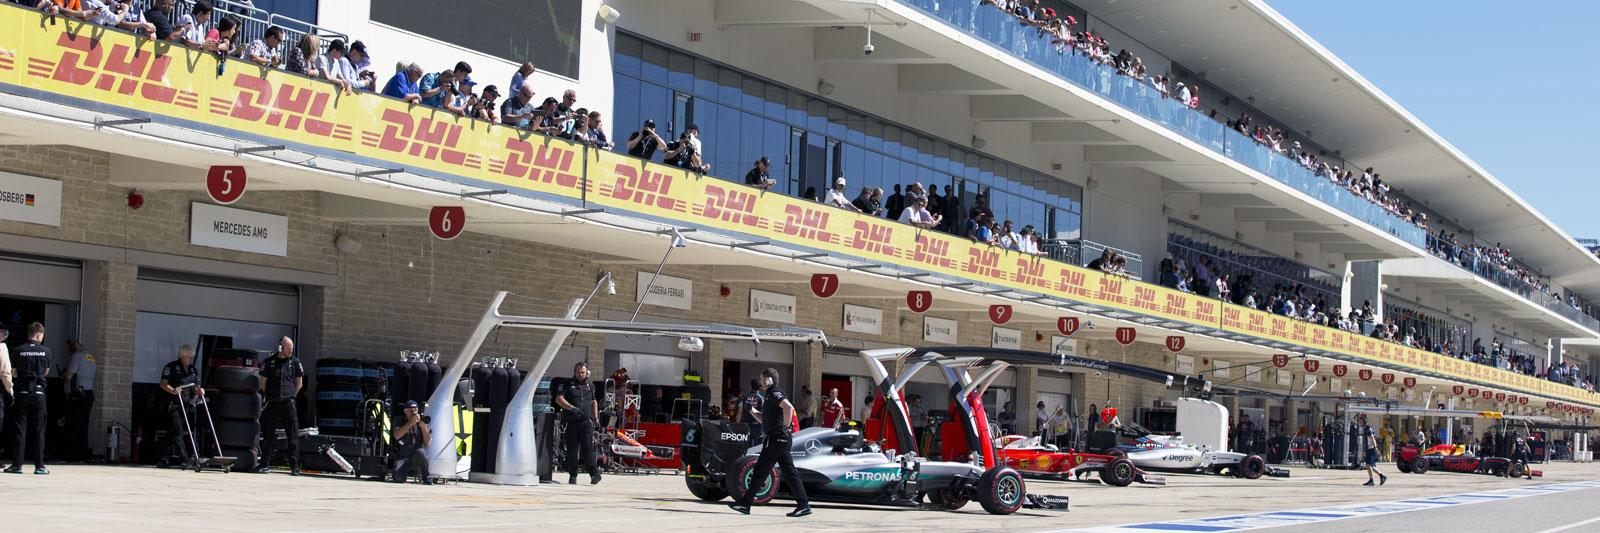 F1 Paddock Club Tickets from Grand Prix Tours